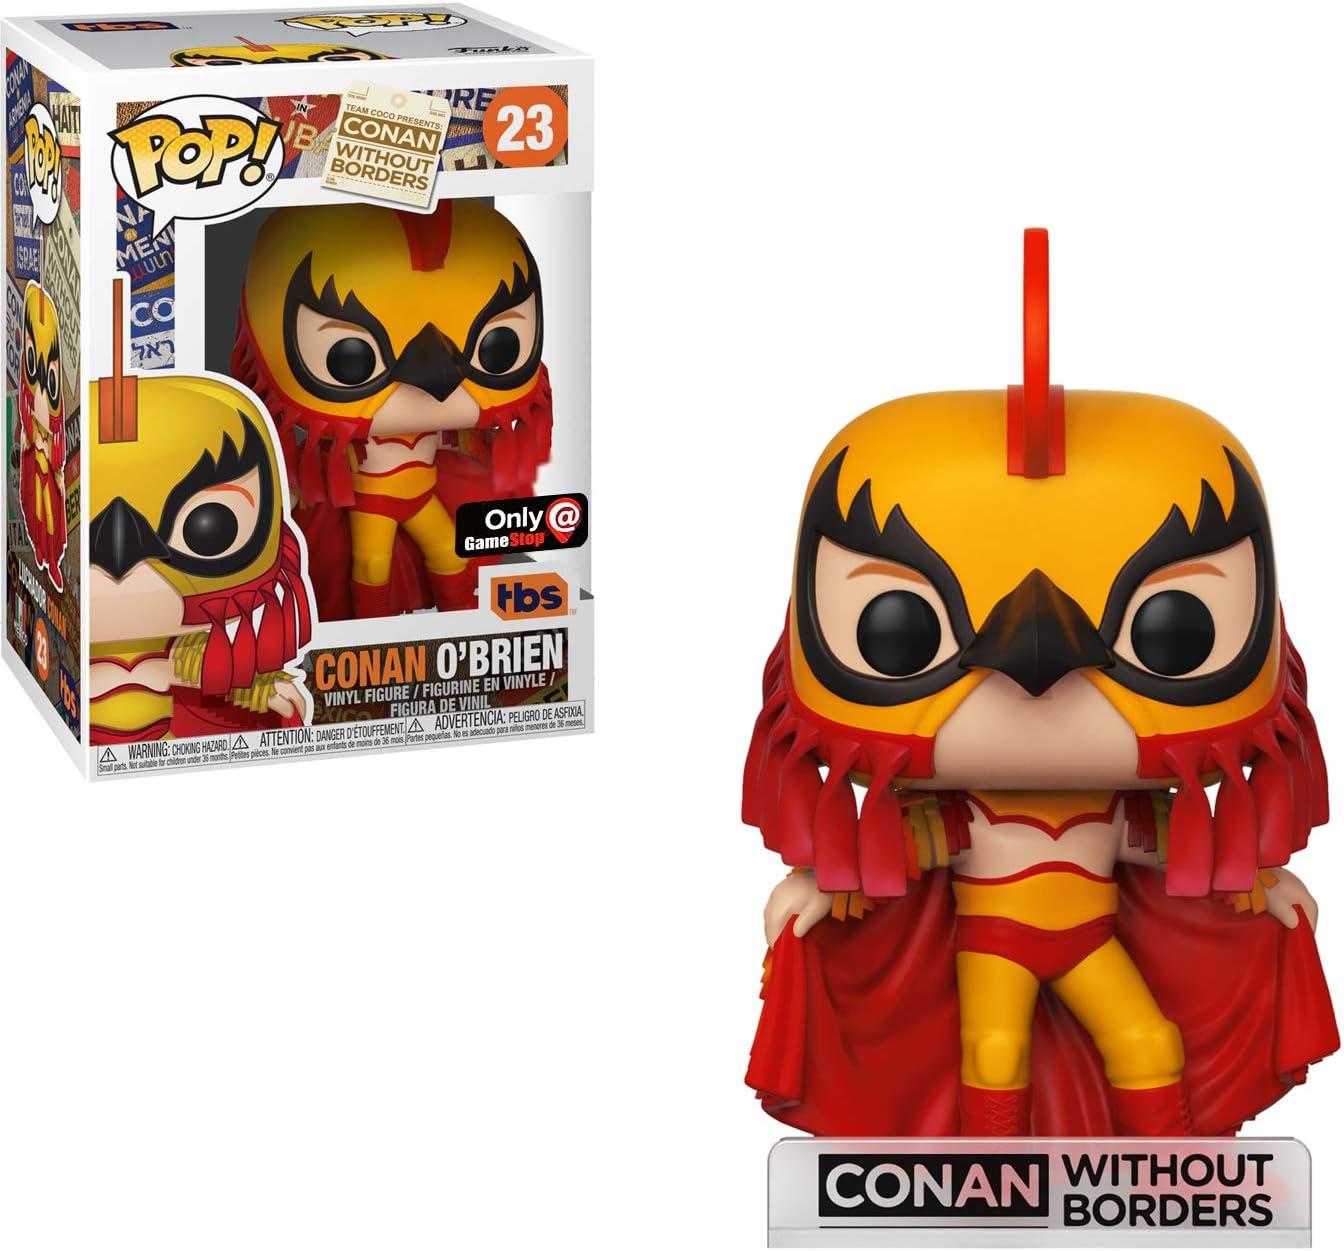 Vinyl Figure /& 1 POP GameStop Exclusive : Conan Without Borders x POP Funko Conan OBrien Compatible PET Plastic Graphical Protector Bundle #024 // 34930 - B